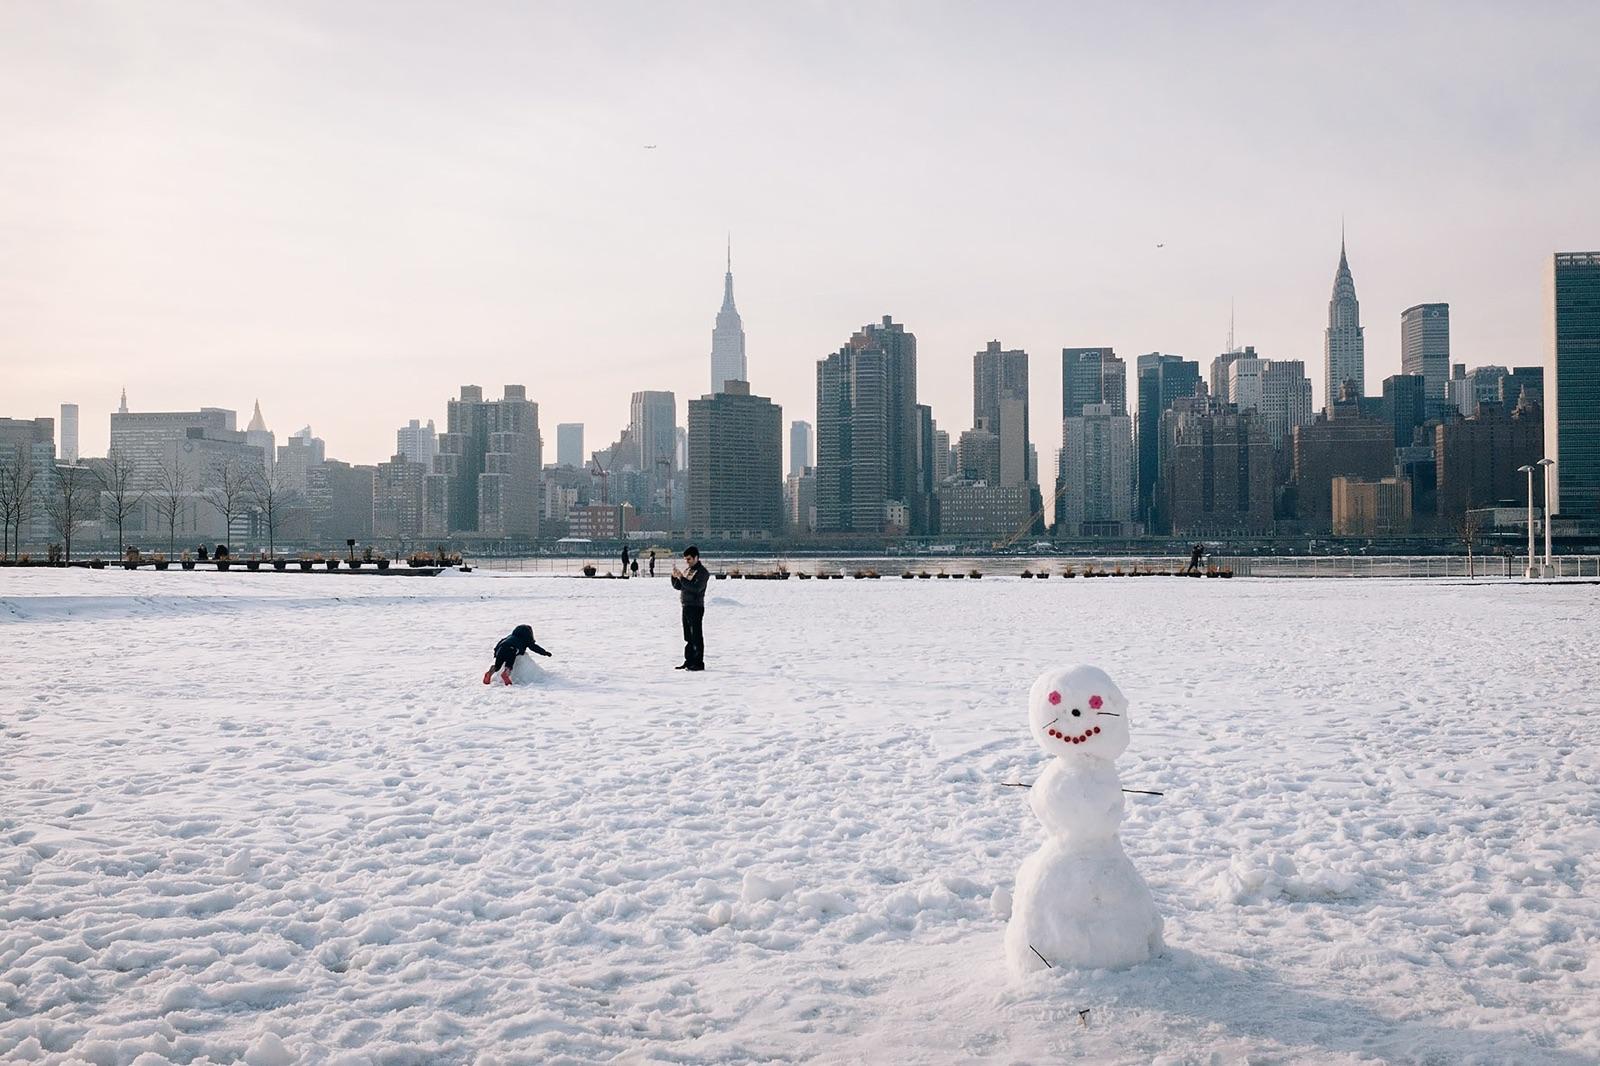 new-york-city-street-photography-collective-frank-multari-2